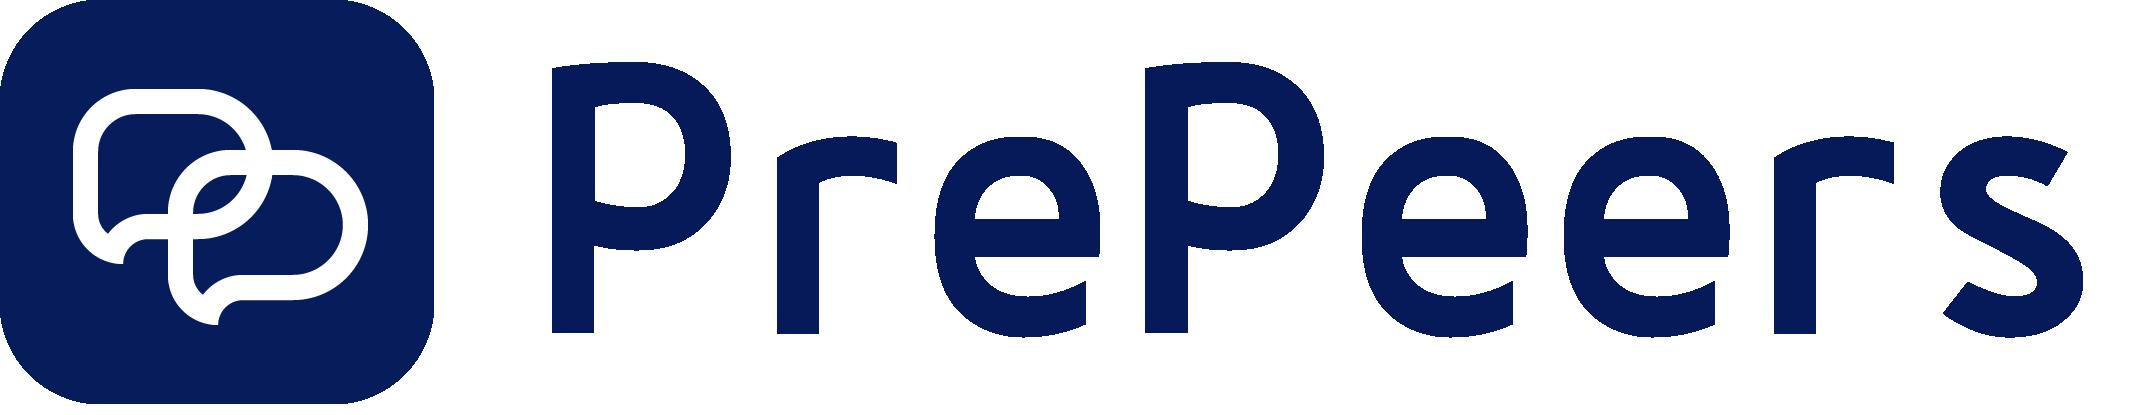 Logo finalprepeers 300dpi transp aplat version 01 2019